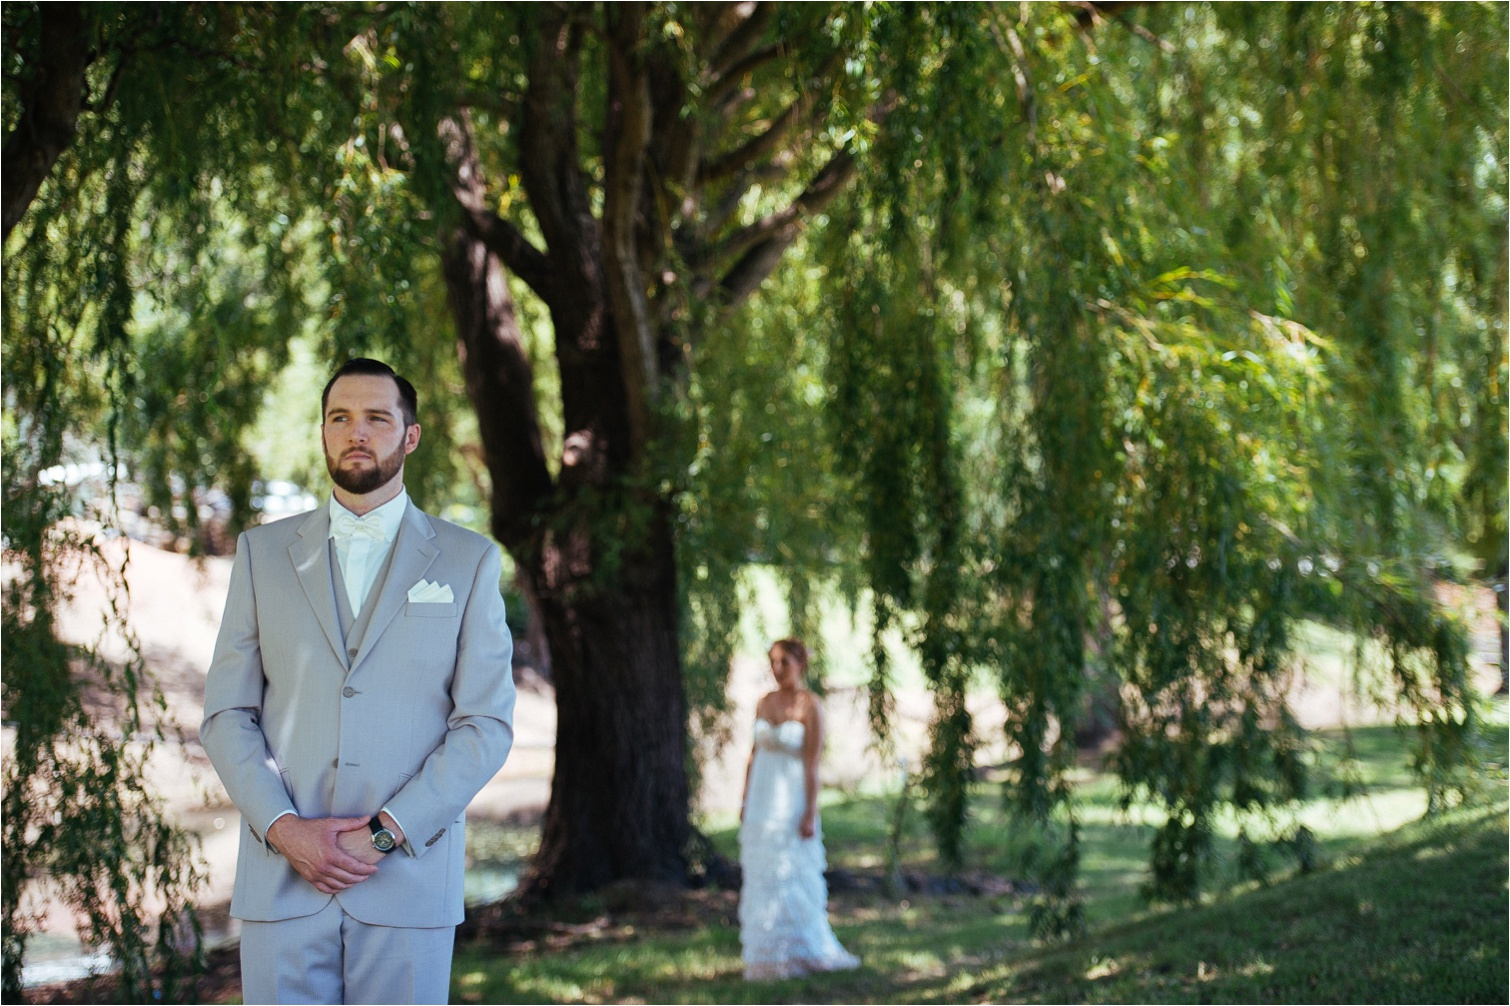 Jenny&Mitch_Sebel_Windsor_Sydney_Polo_Club_wedding-by_The_Follans_Gold_Coast_Wedding_Photographers_0022.jpg